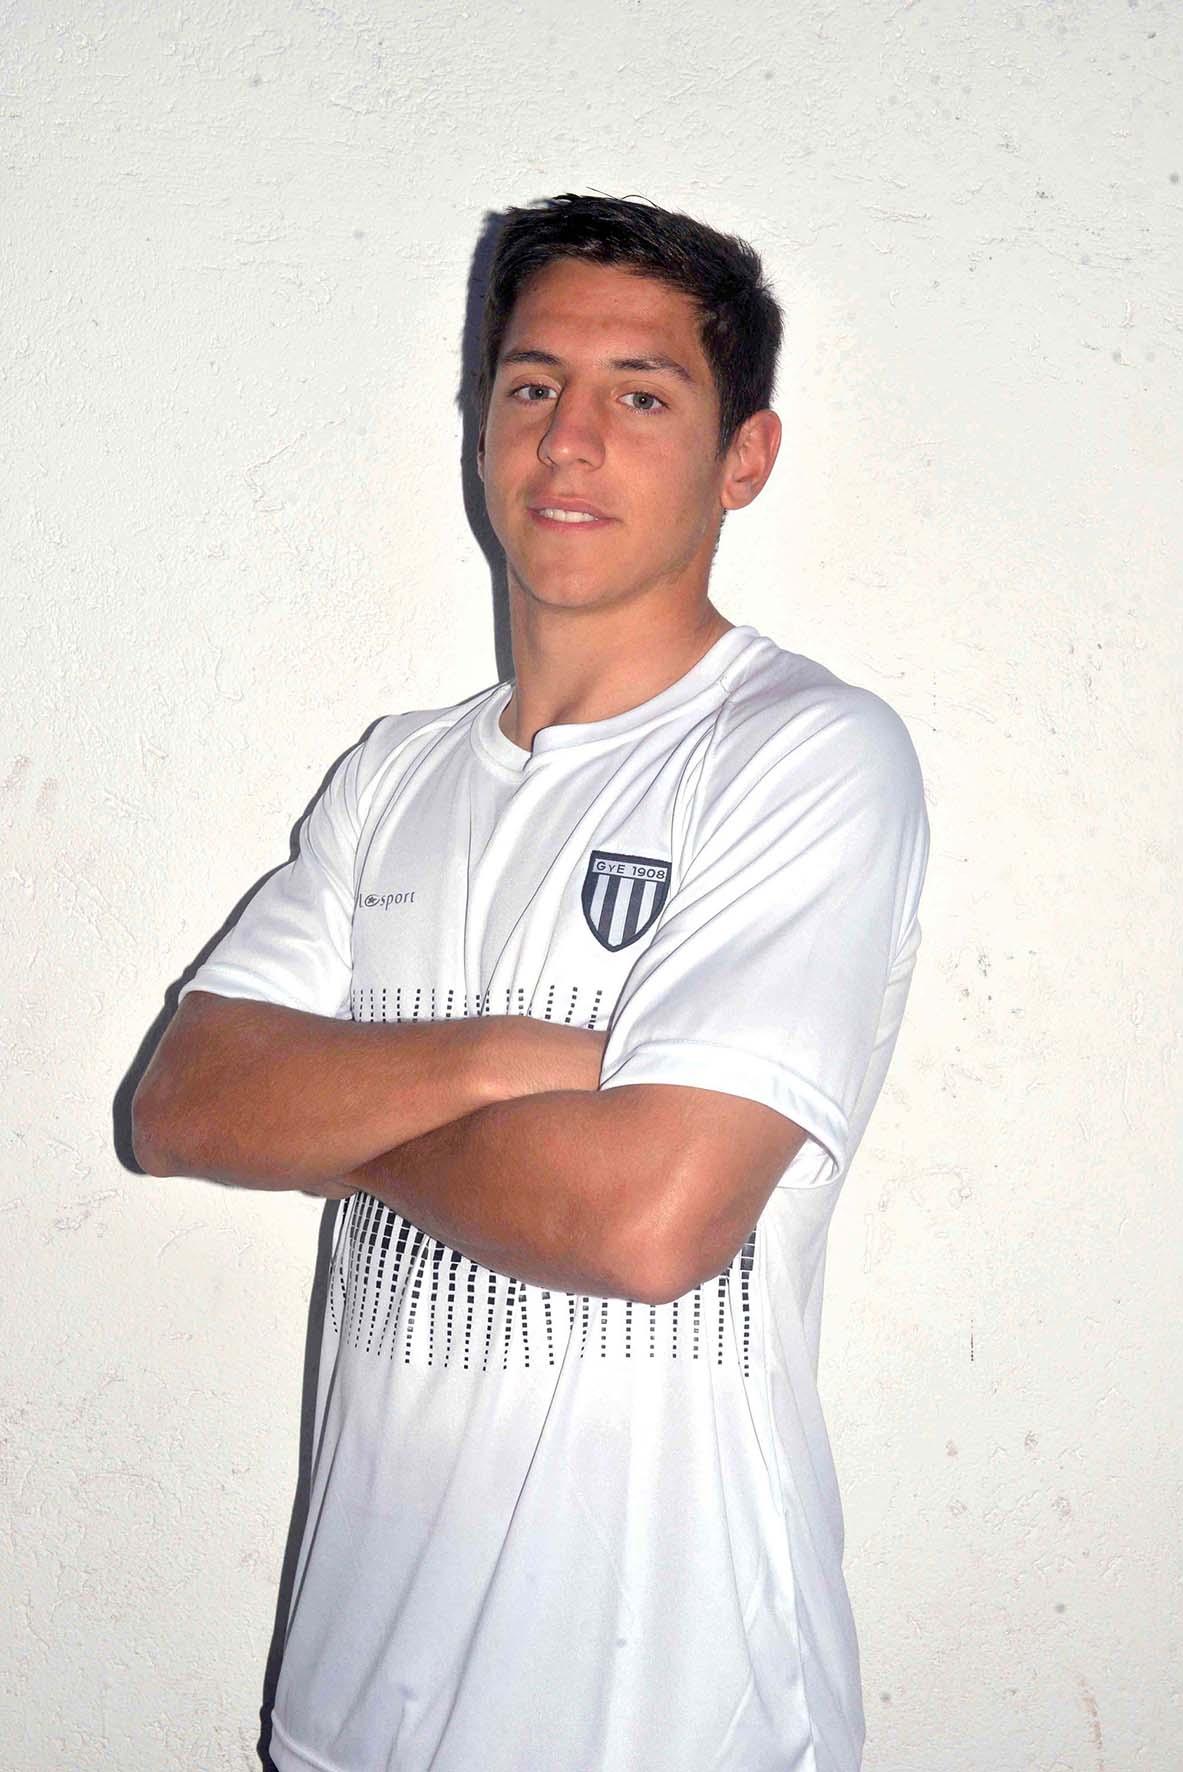 Alan Barbero